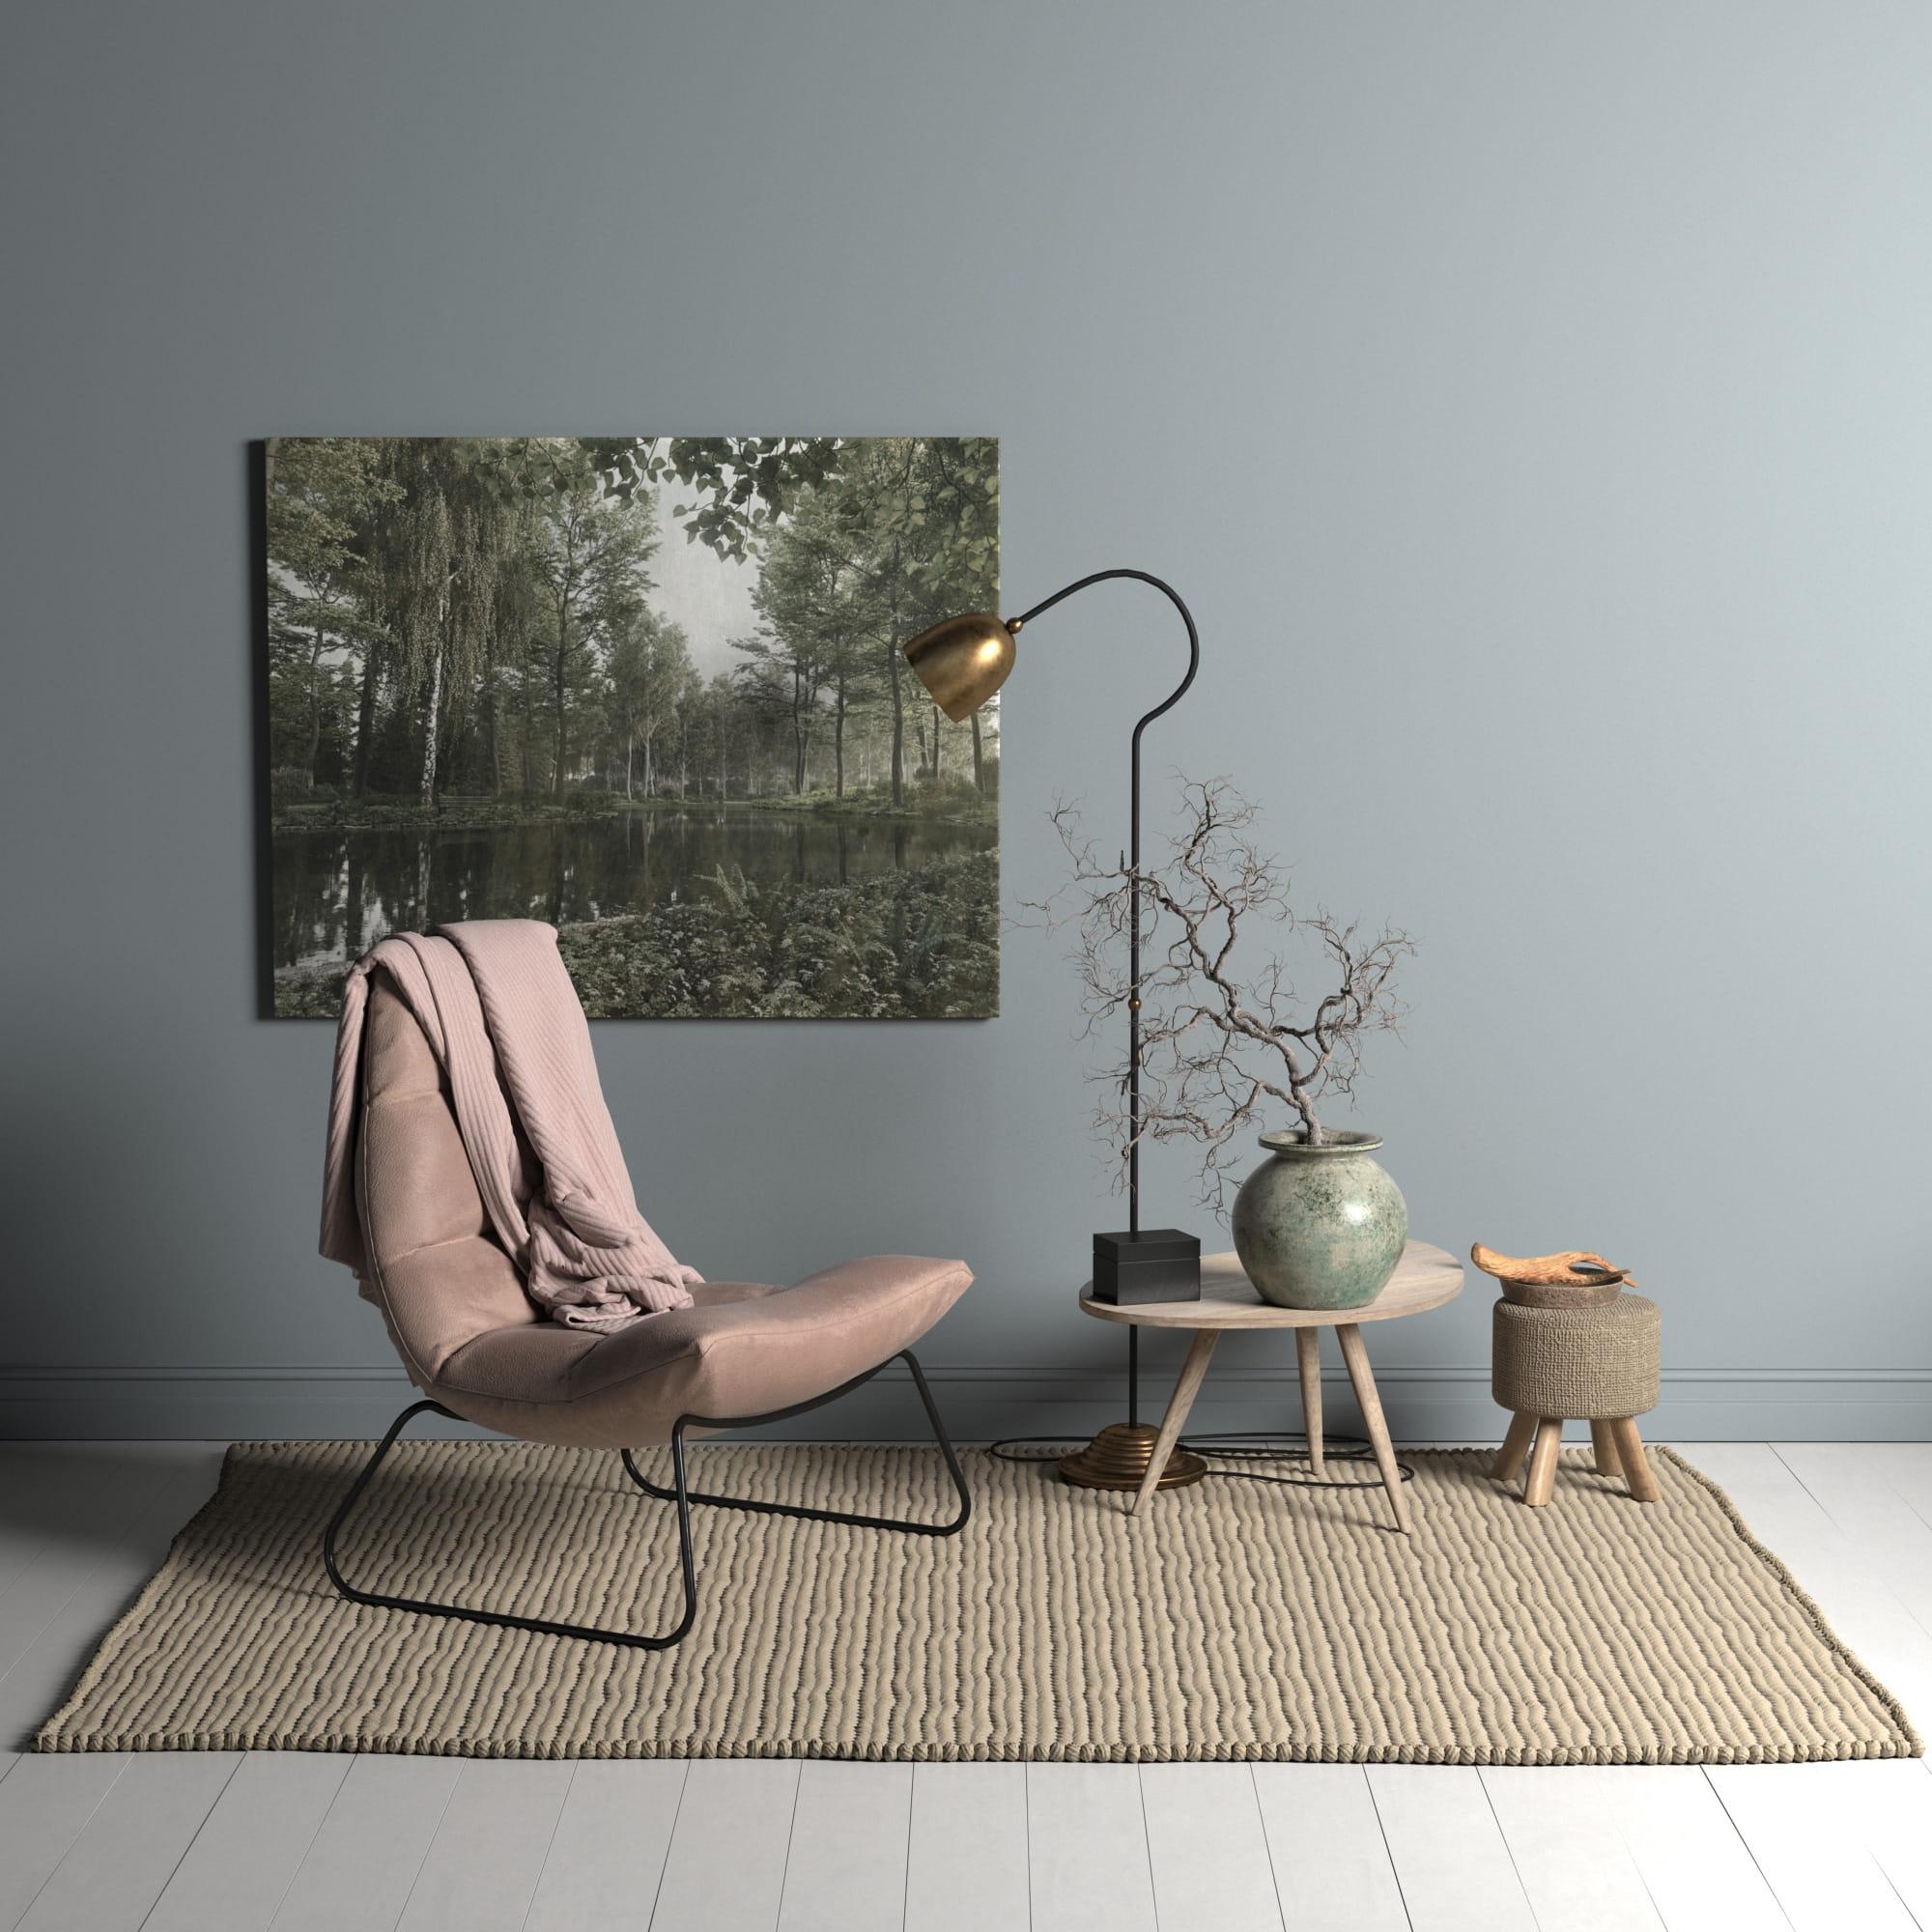 furniture set 17 AM225